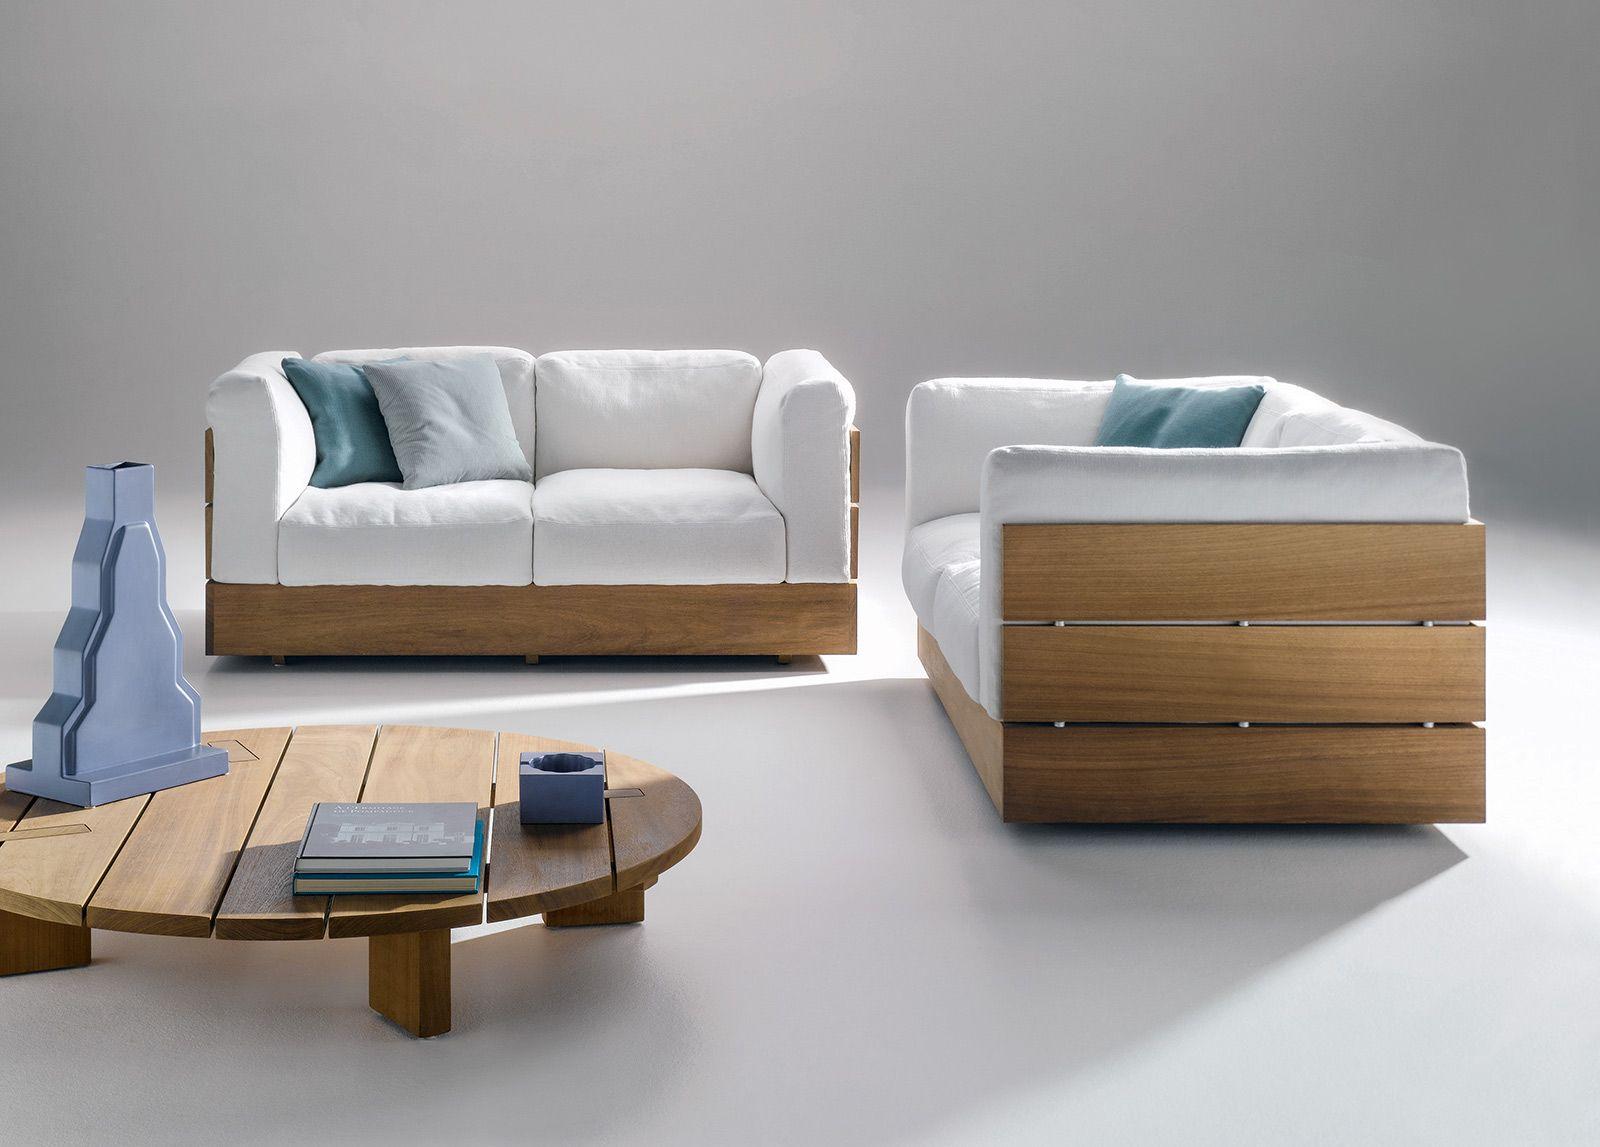 Stave© sofa piero lissoni bonacina 1889 sofa in 2019 sofa